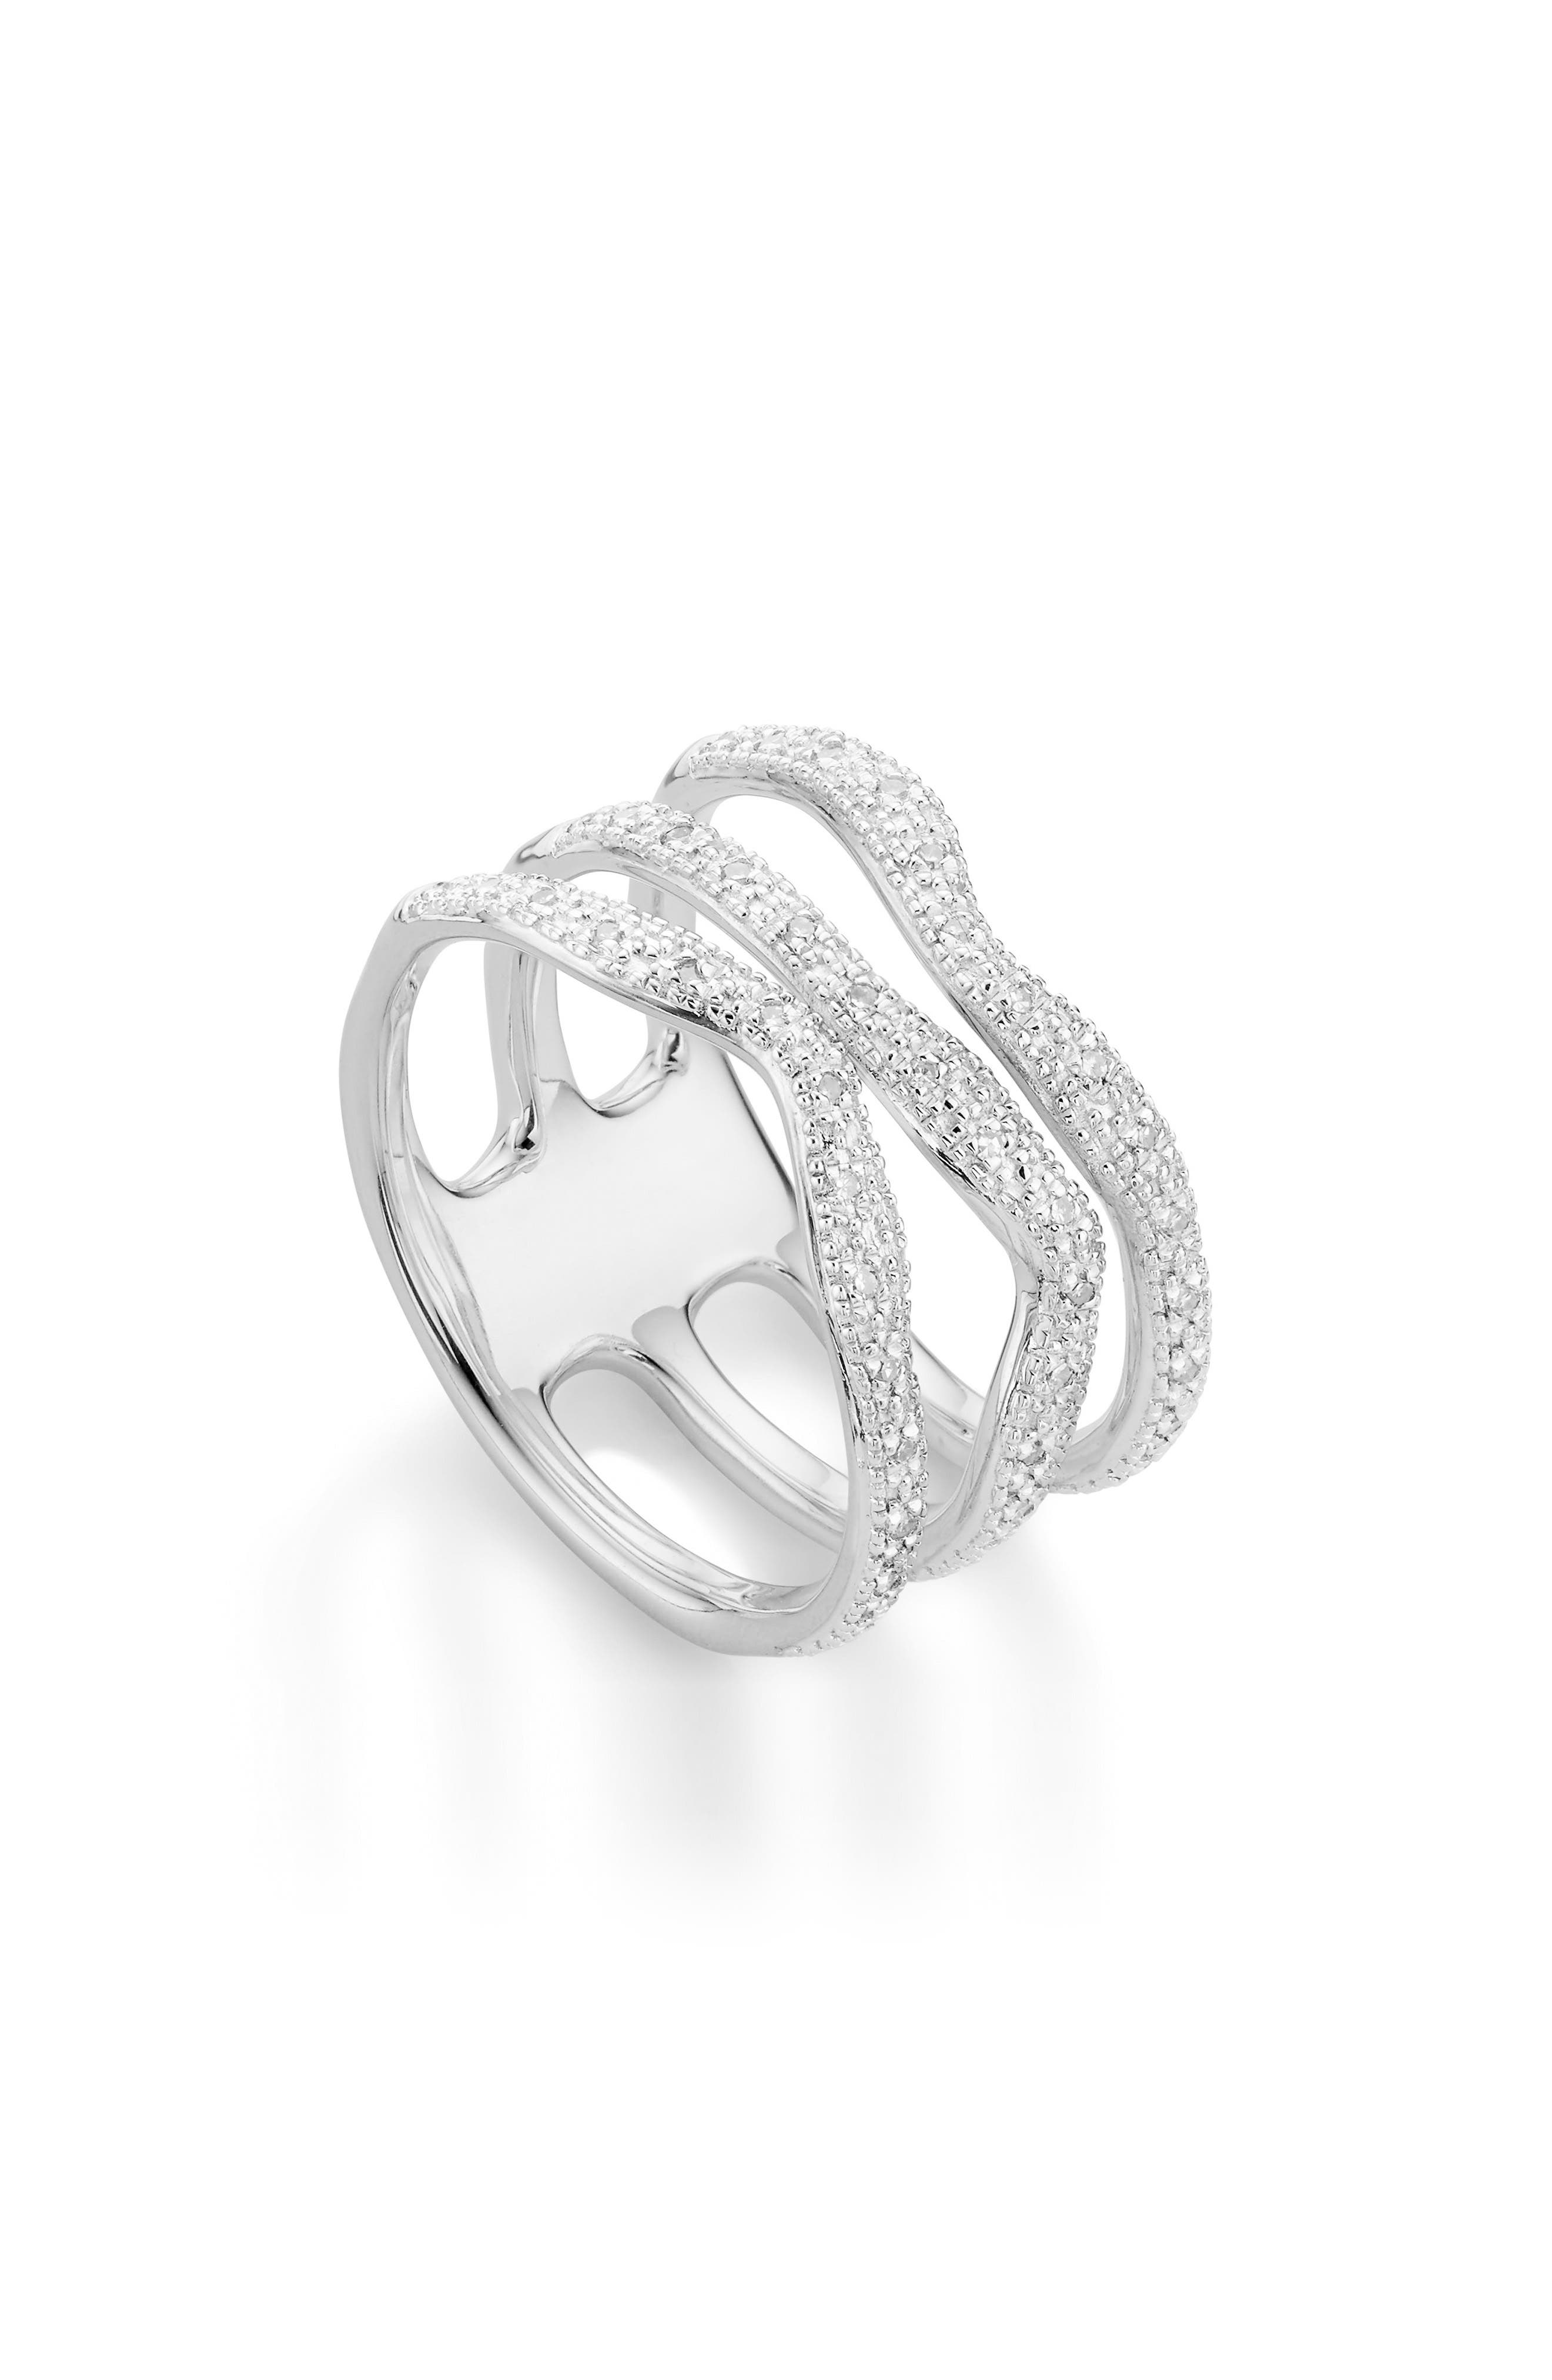 MONICA VINADER, Riva Triple Wave Diamond Ring, Alternate thumbnail 2, color, SILVER